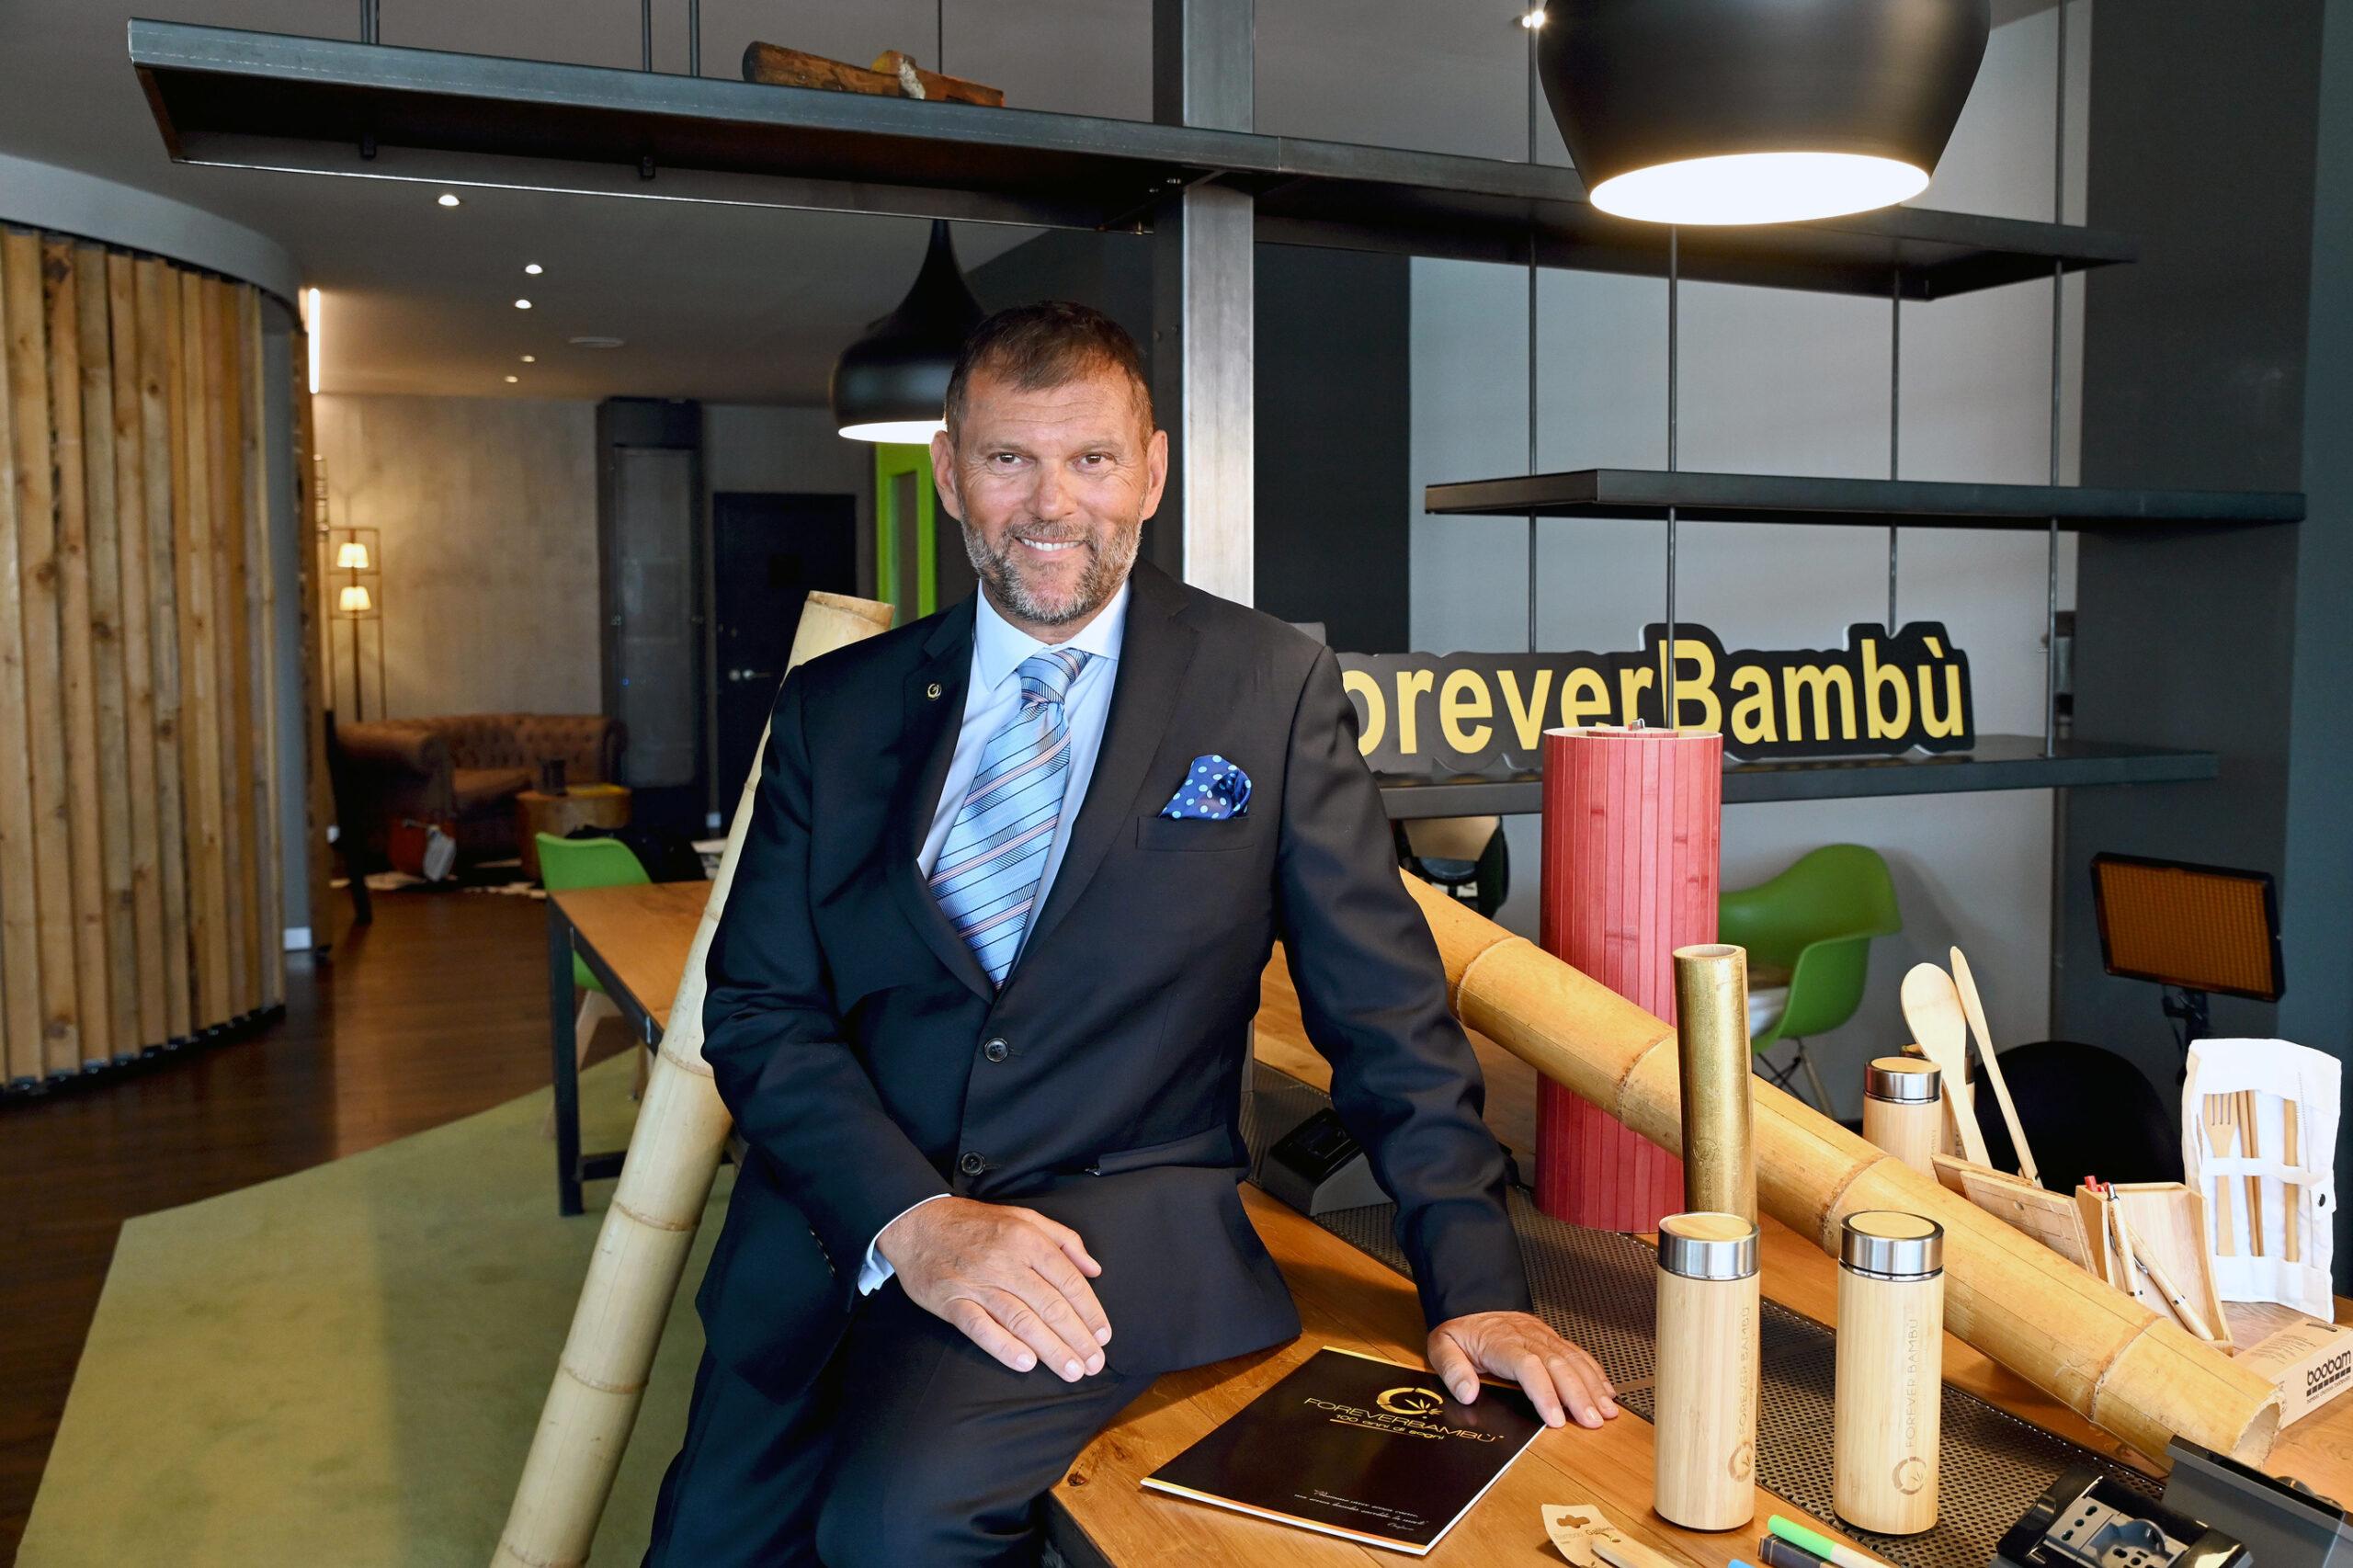 Emanuele Rissone Presidente e Fondatore Forever Bambù